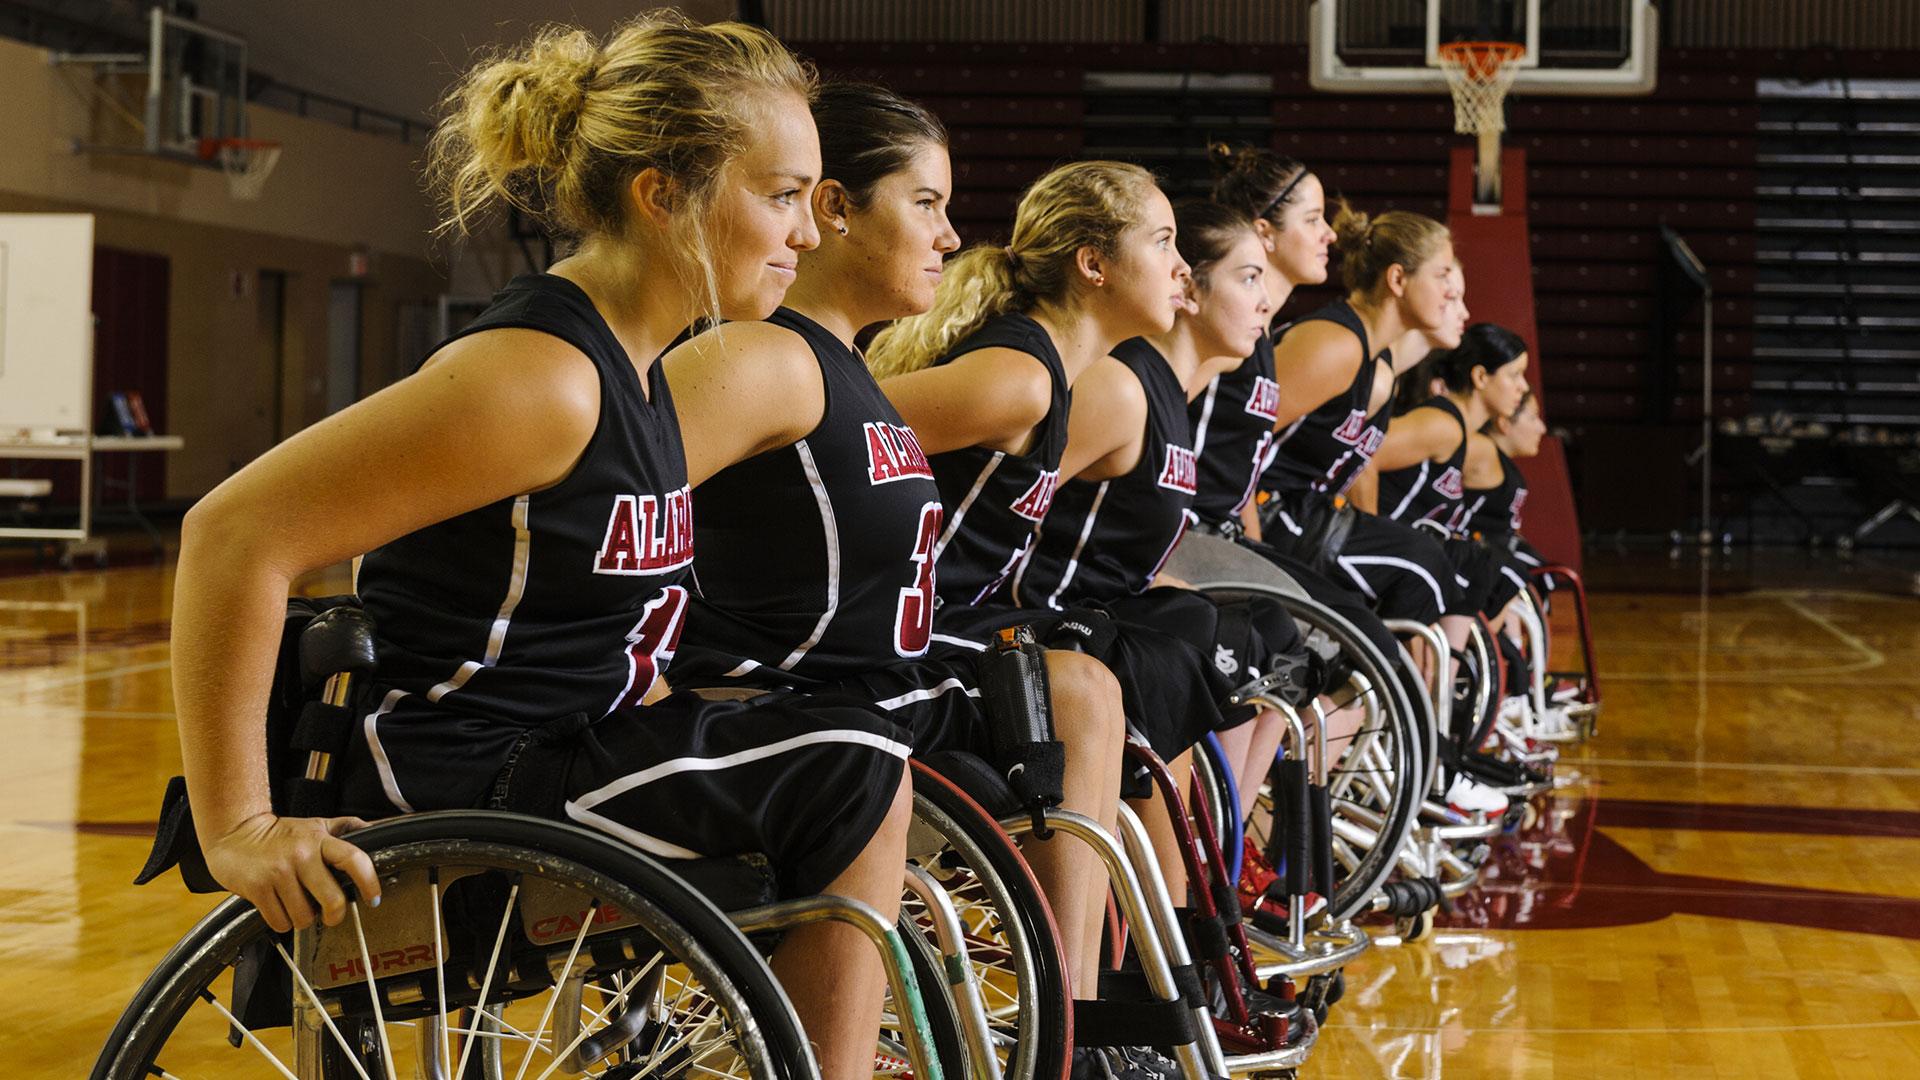 Women's Wheelchair Basketball team.